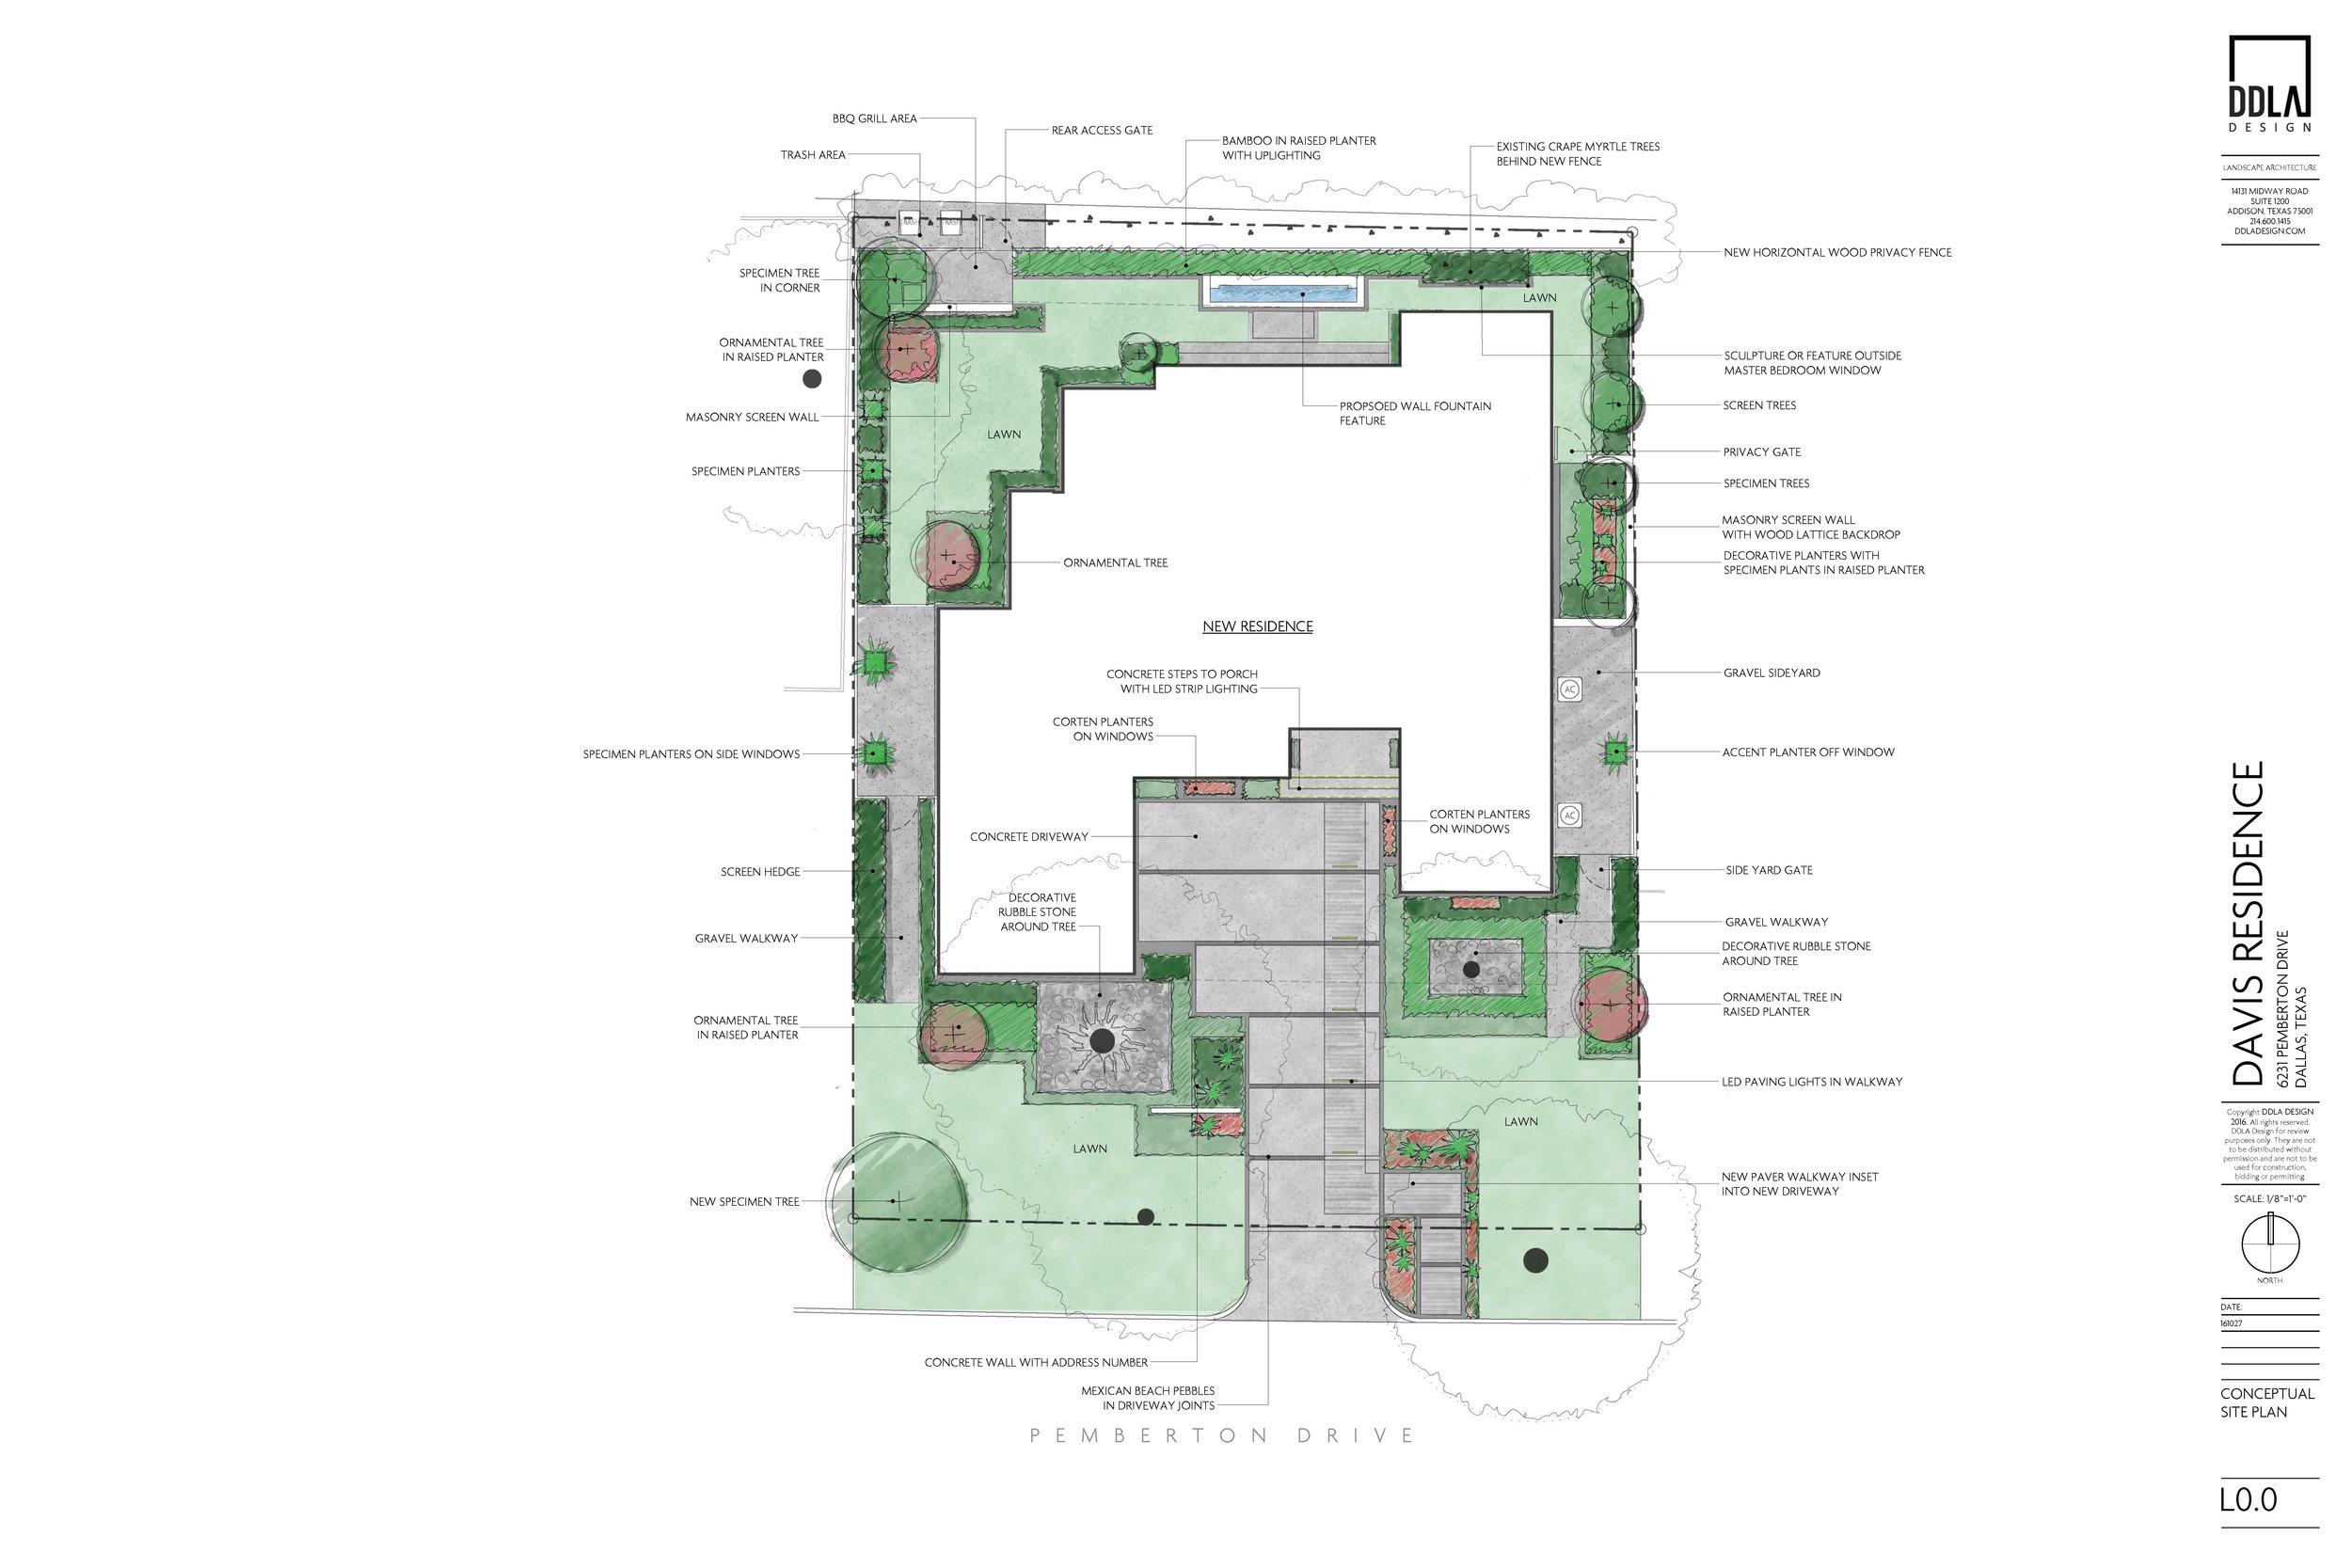 161027 davis_conceptual plan.jpg